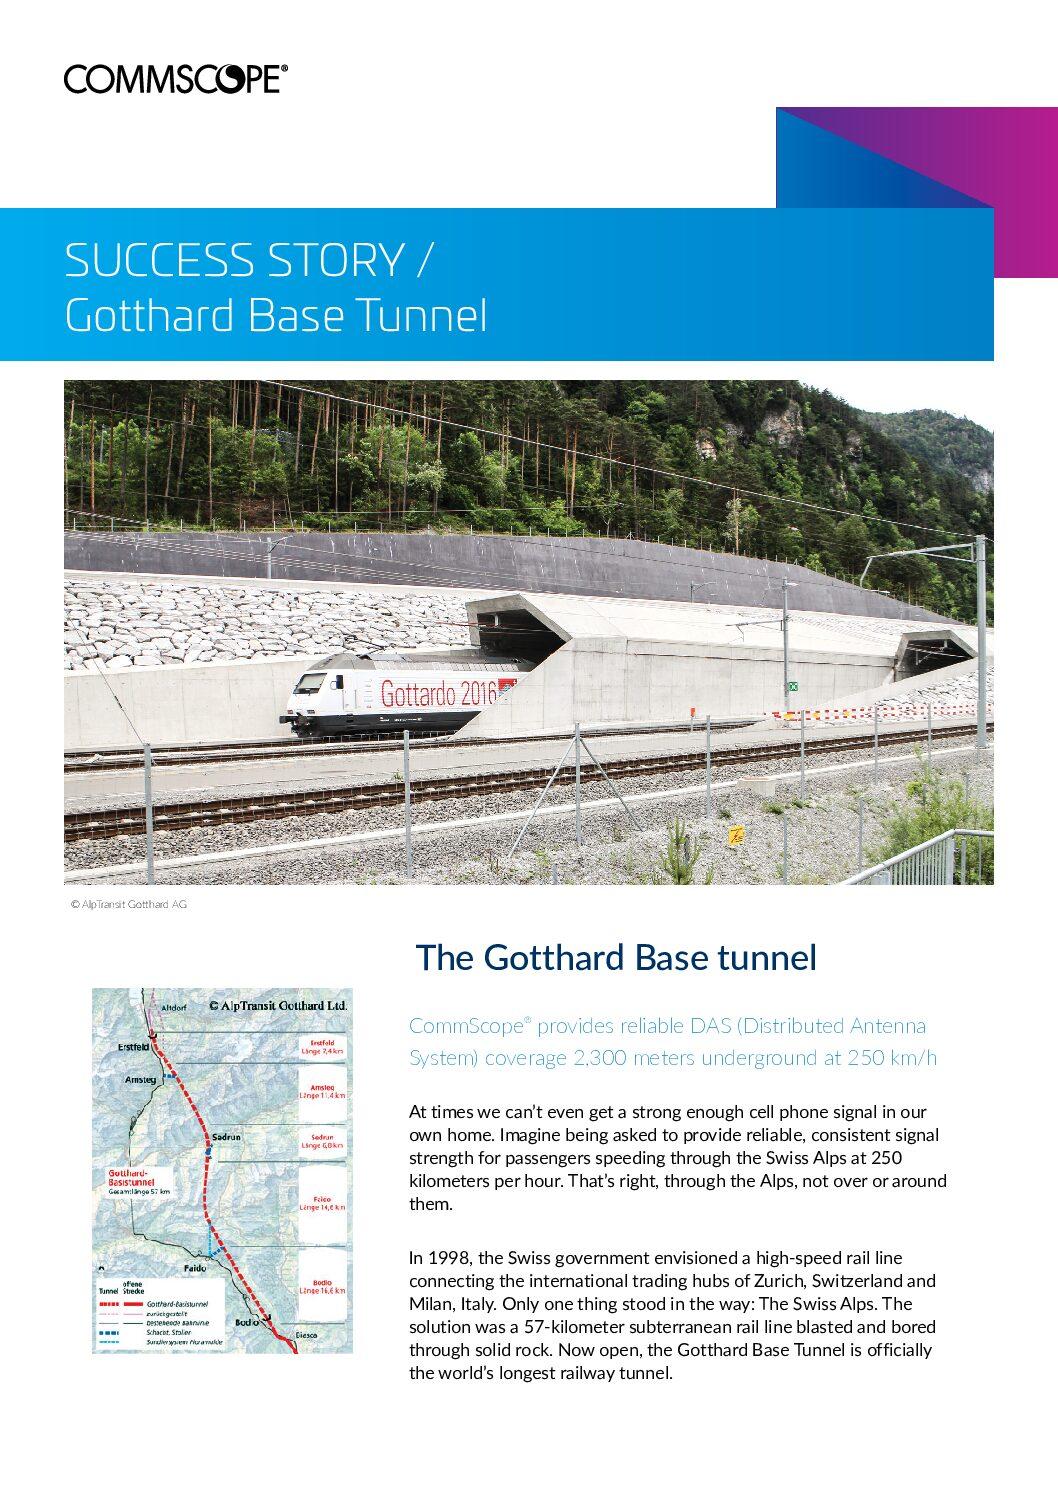 Gotthard Base Tunnel Case Study